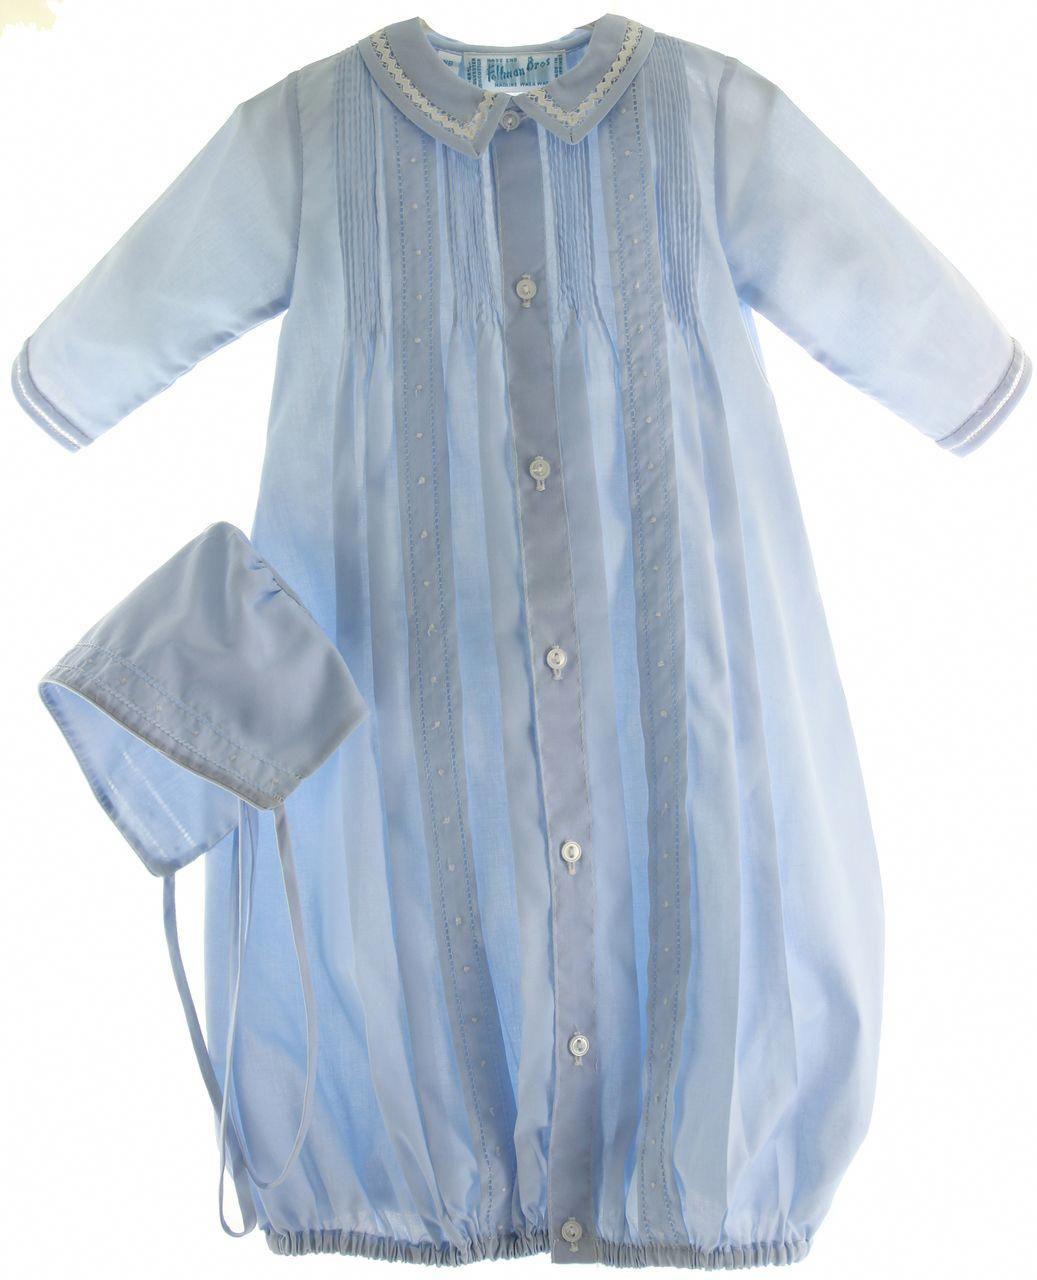 c05159757 Hiccups Childrens Boutique - Newborn Boys Blue Heirloom Gown